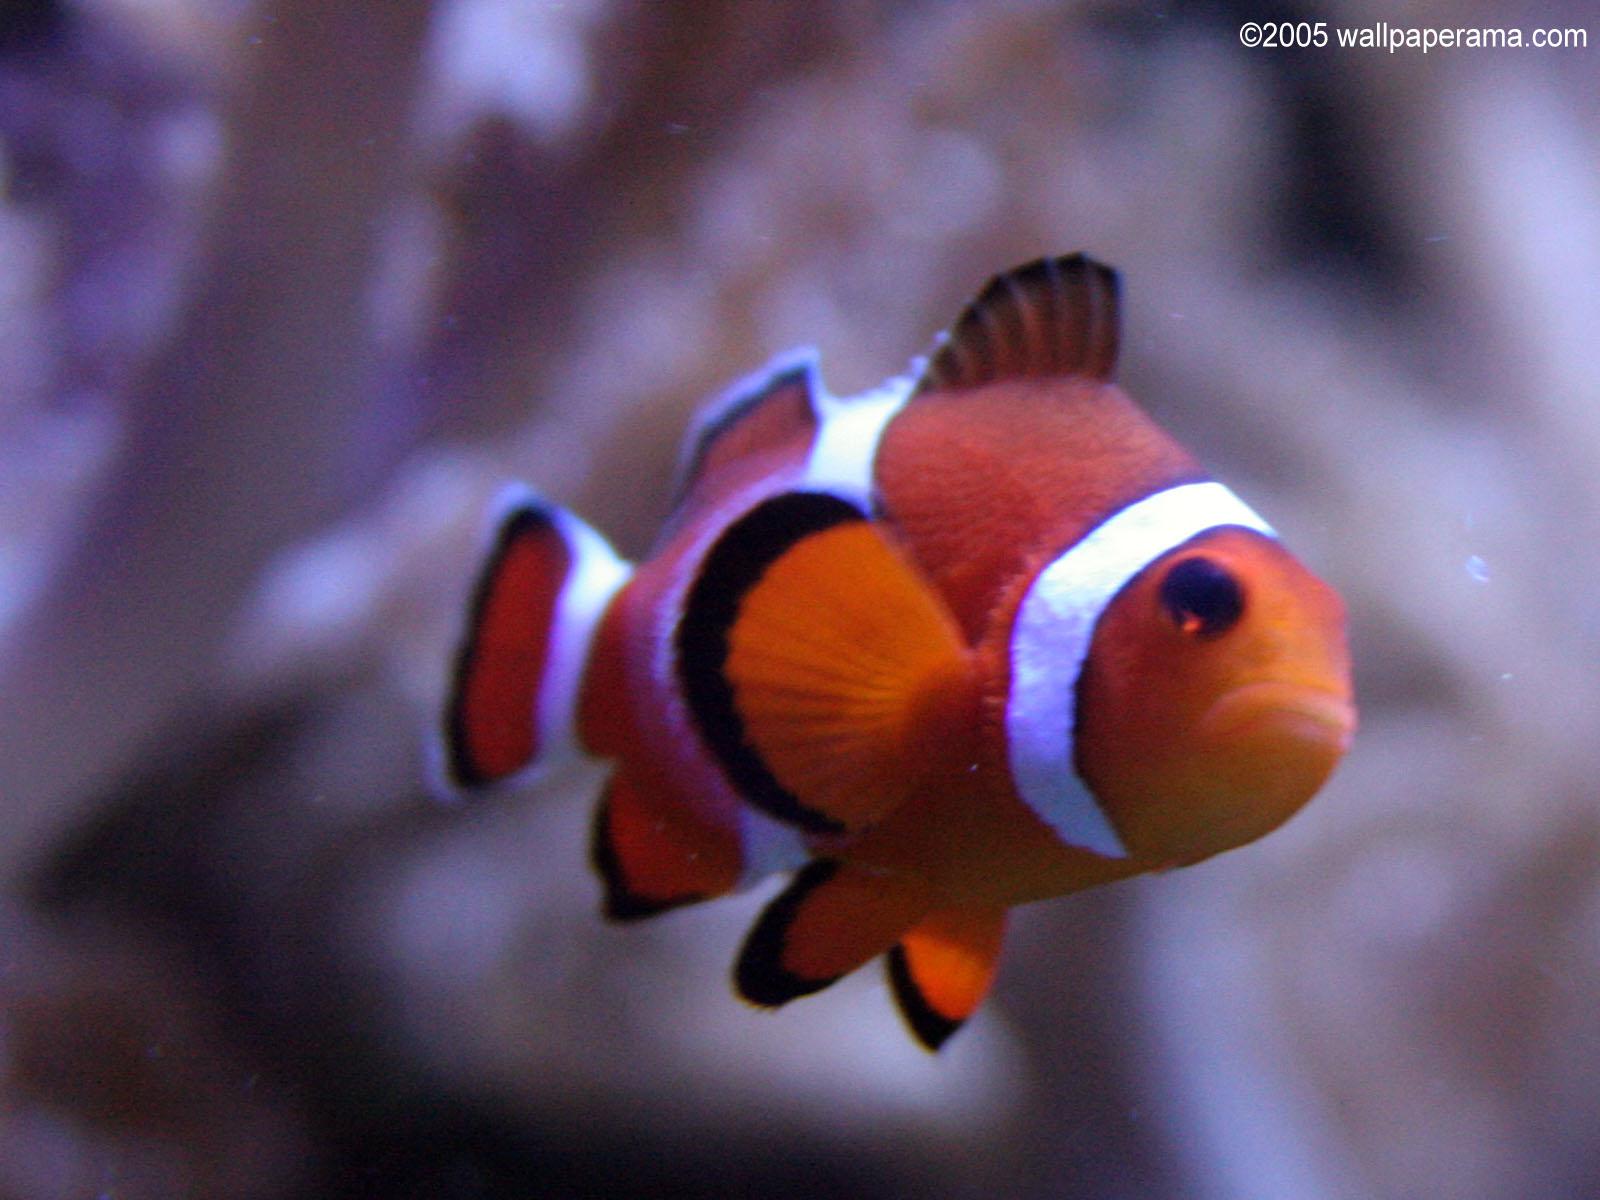 Clown Fish Hd Wallpaper Iphone 4 Clown Fish Close Up Wallpaper Free Hd Backgrounds Images